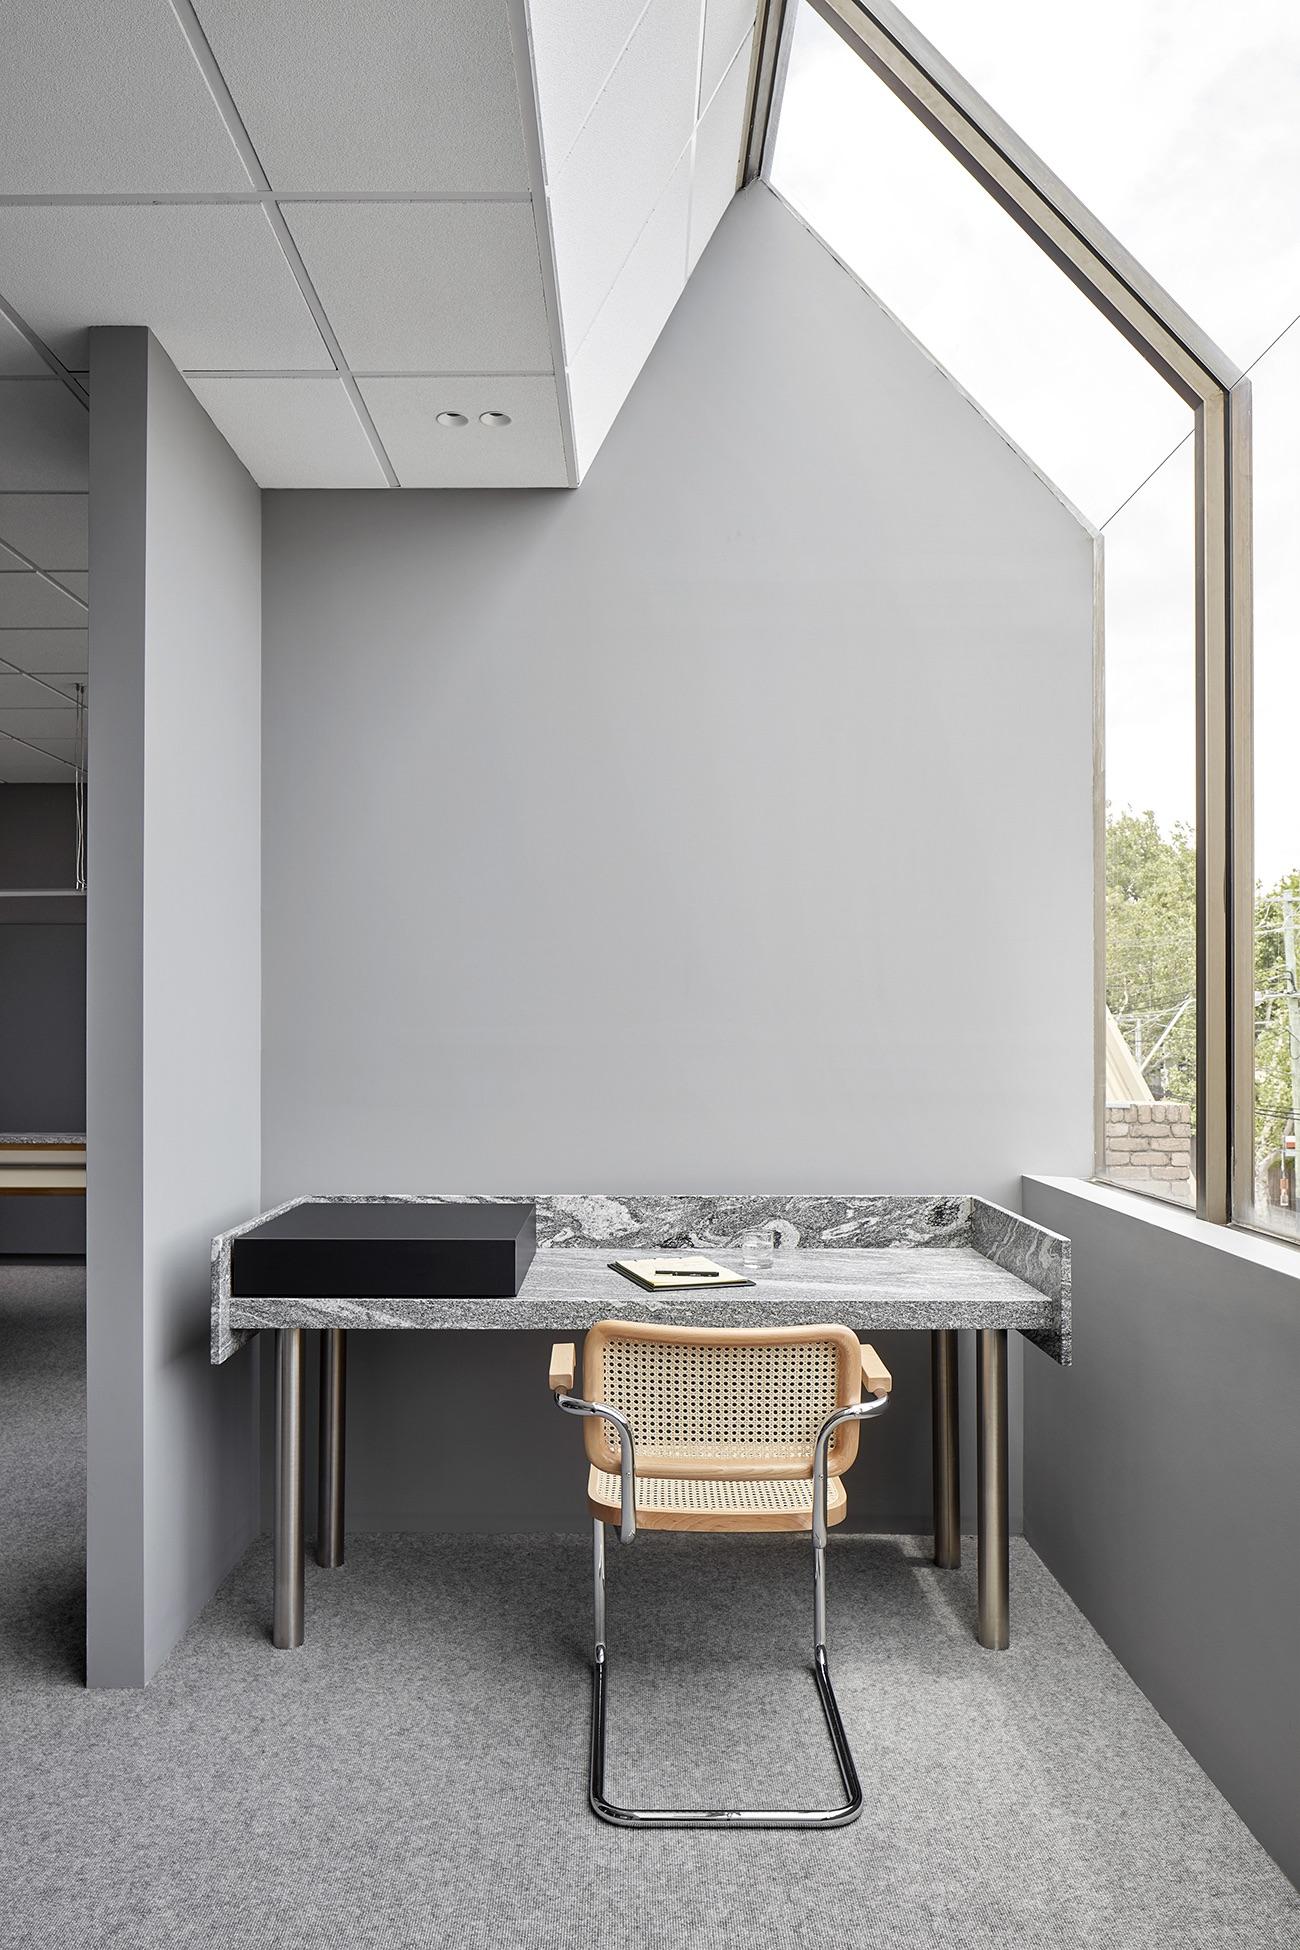 davidov-architects-studio-office-7